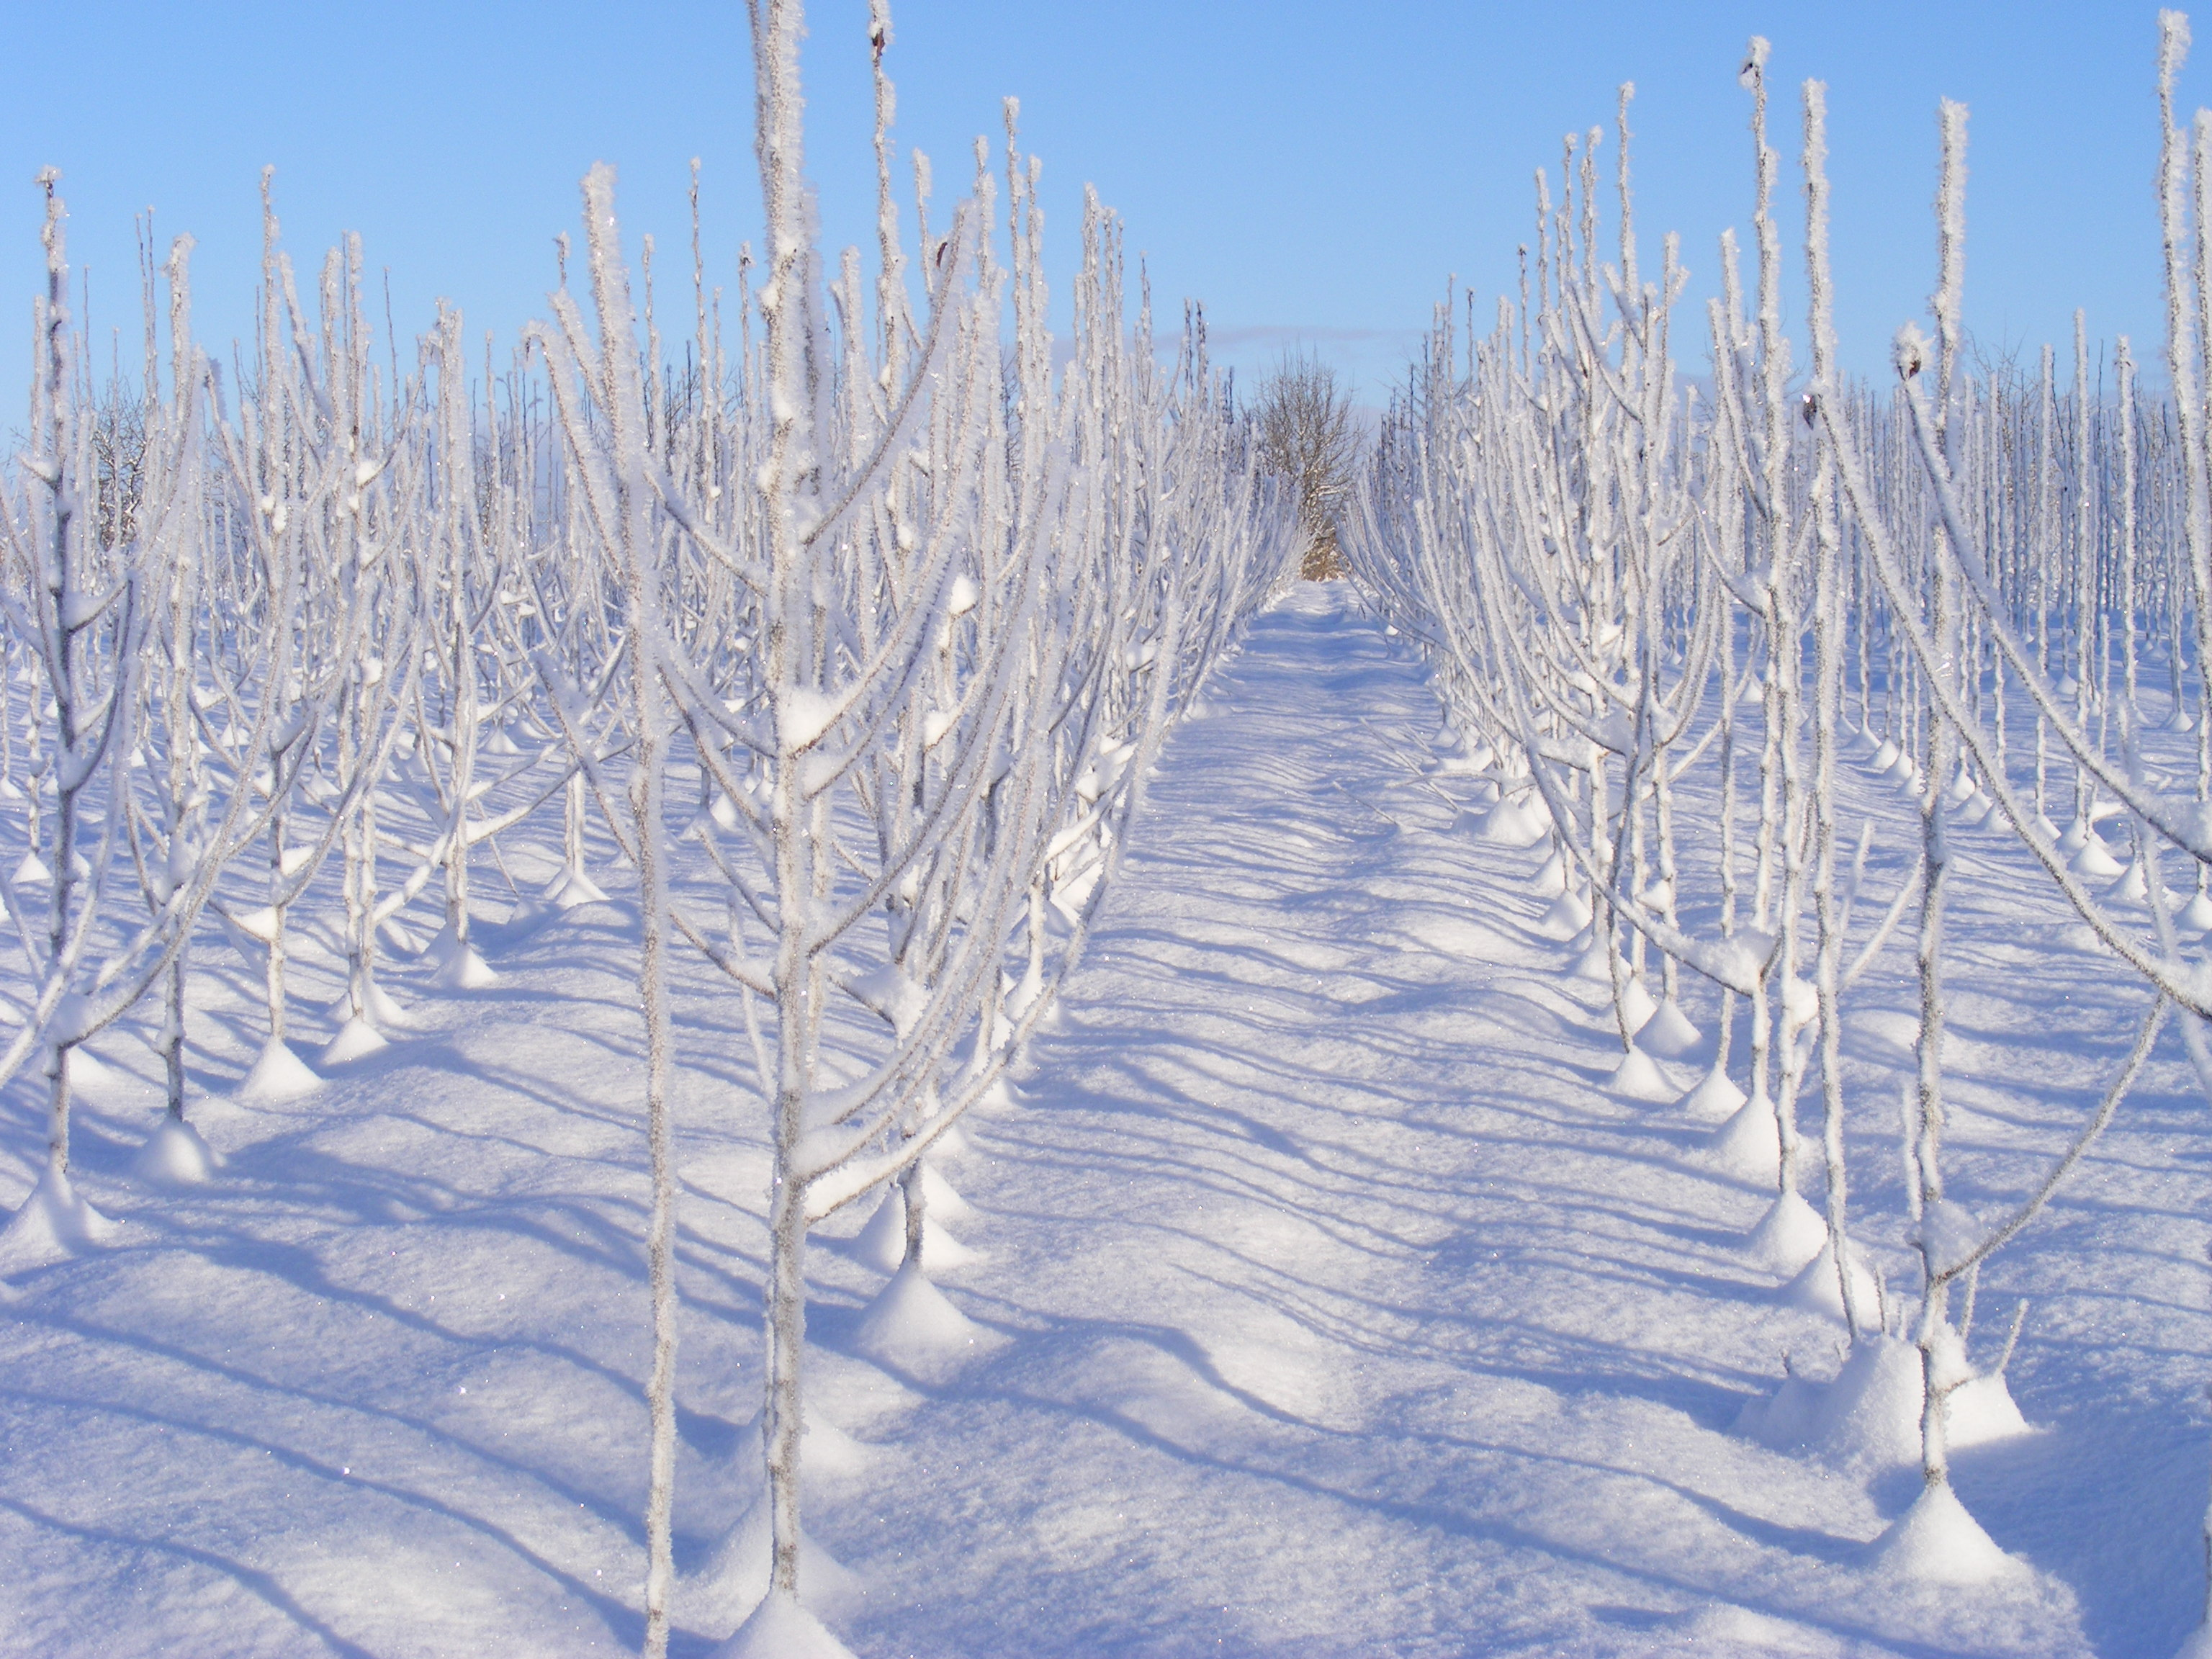 Augļu koku stādi